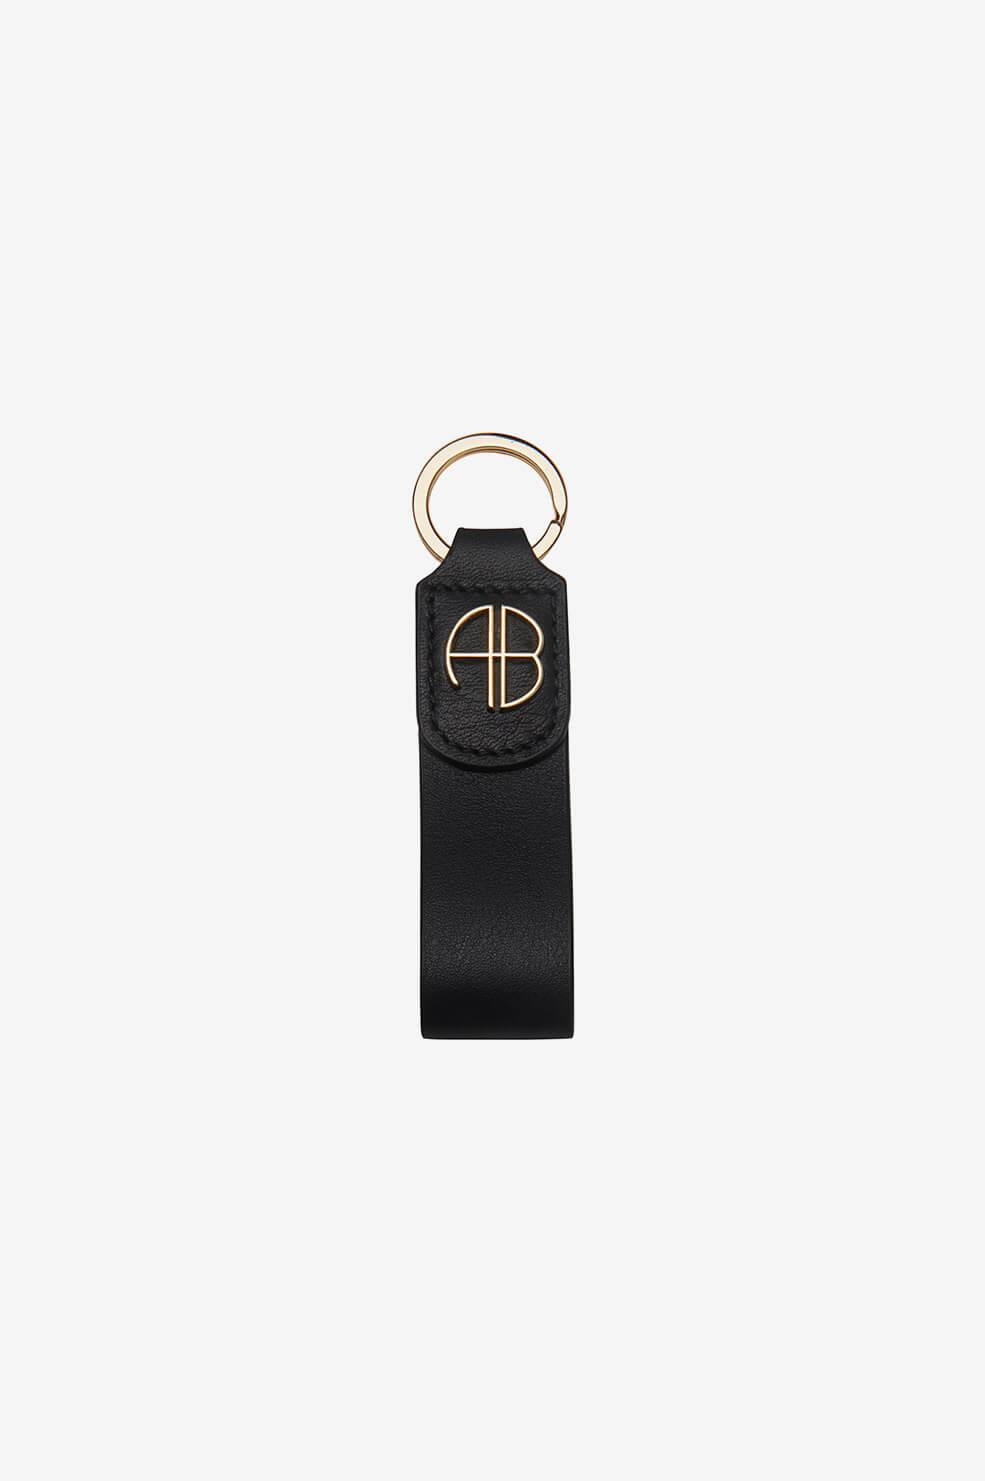 ANINE BING AB Key Chain in Black  - Black - Size: One Size